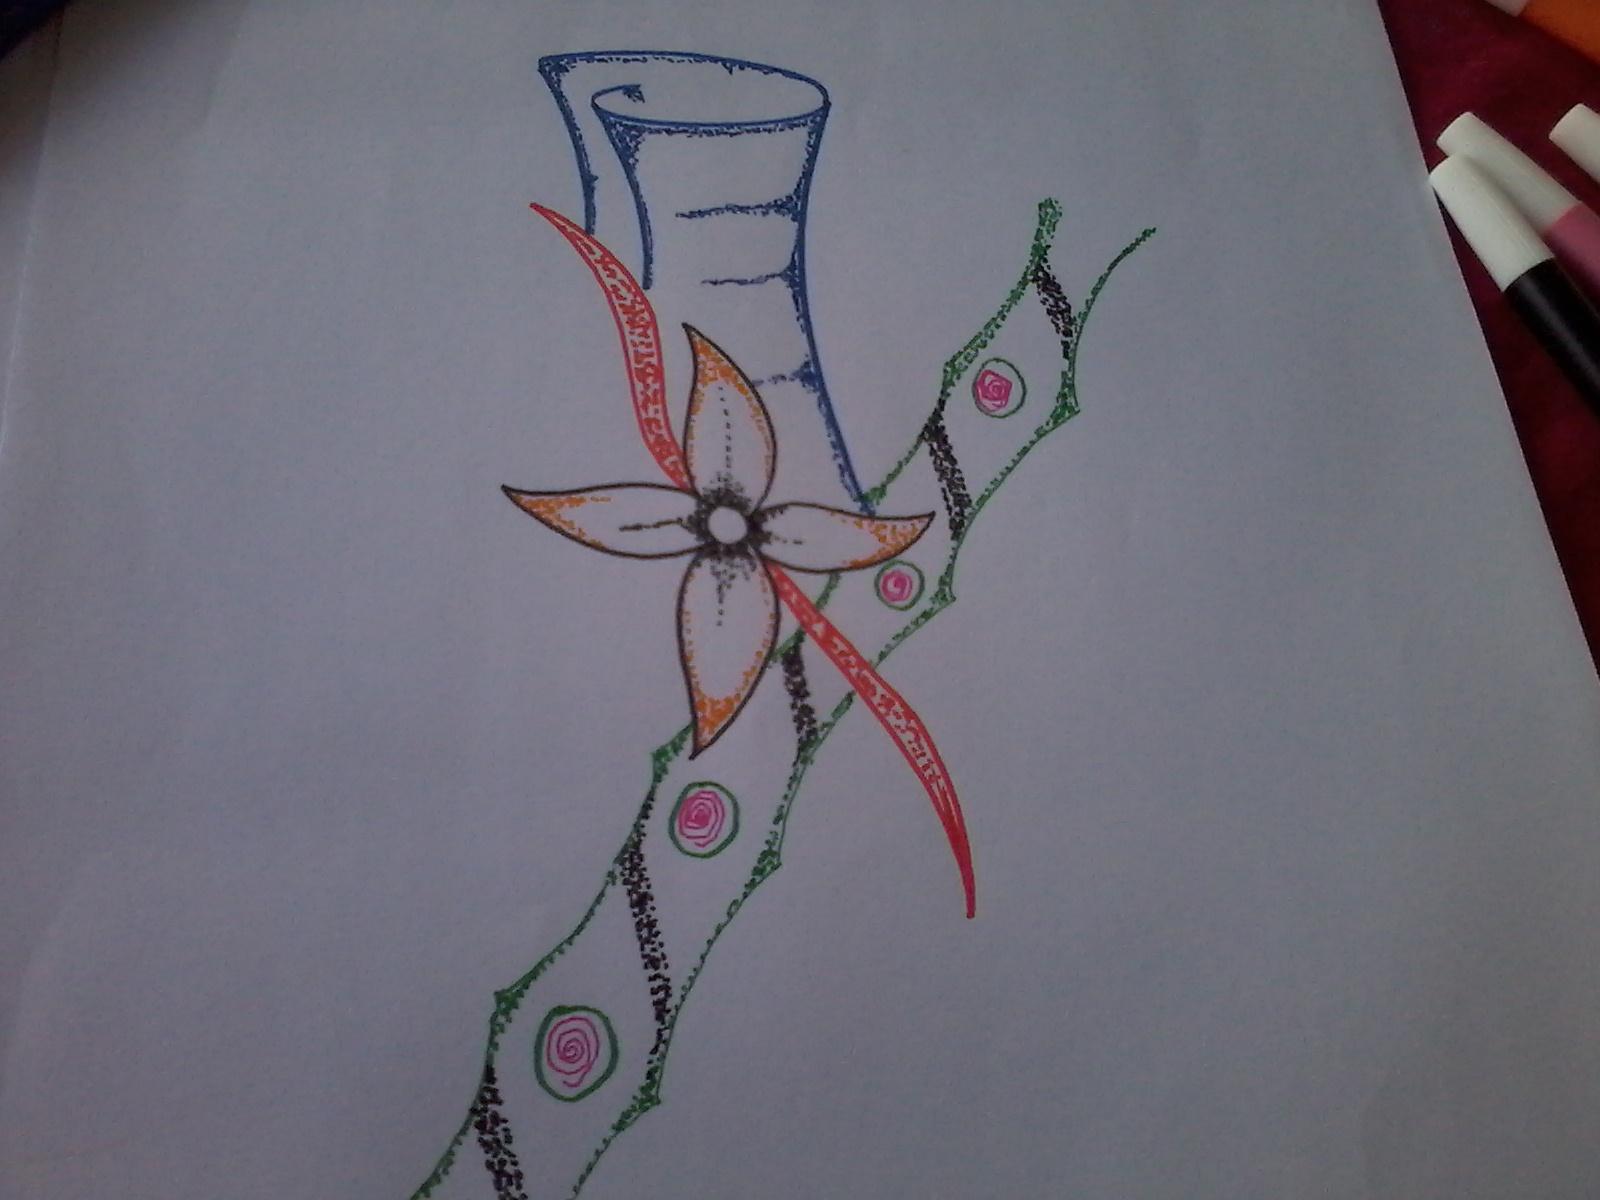 Belajar membuat grafiti sederhana untuk anak tk kang jum